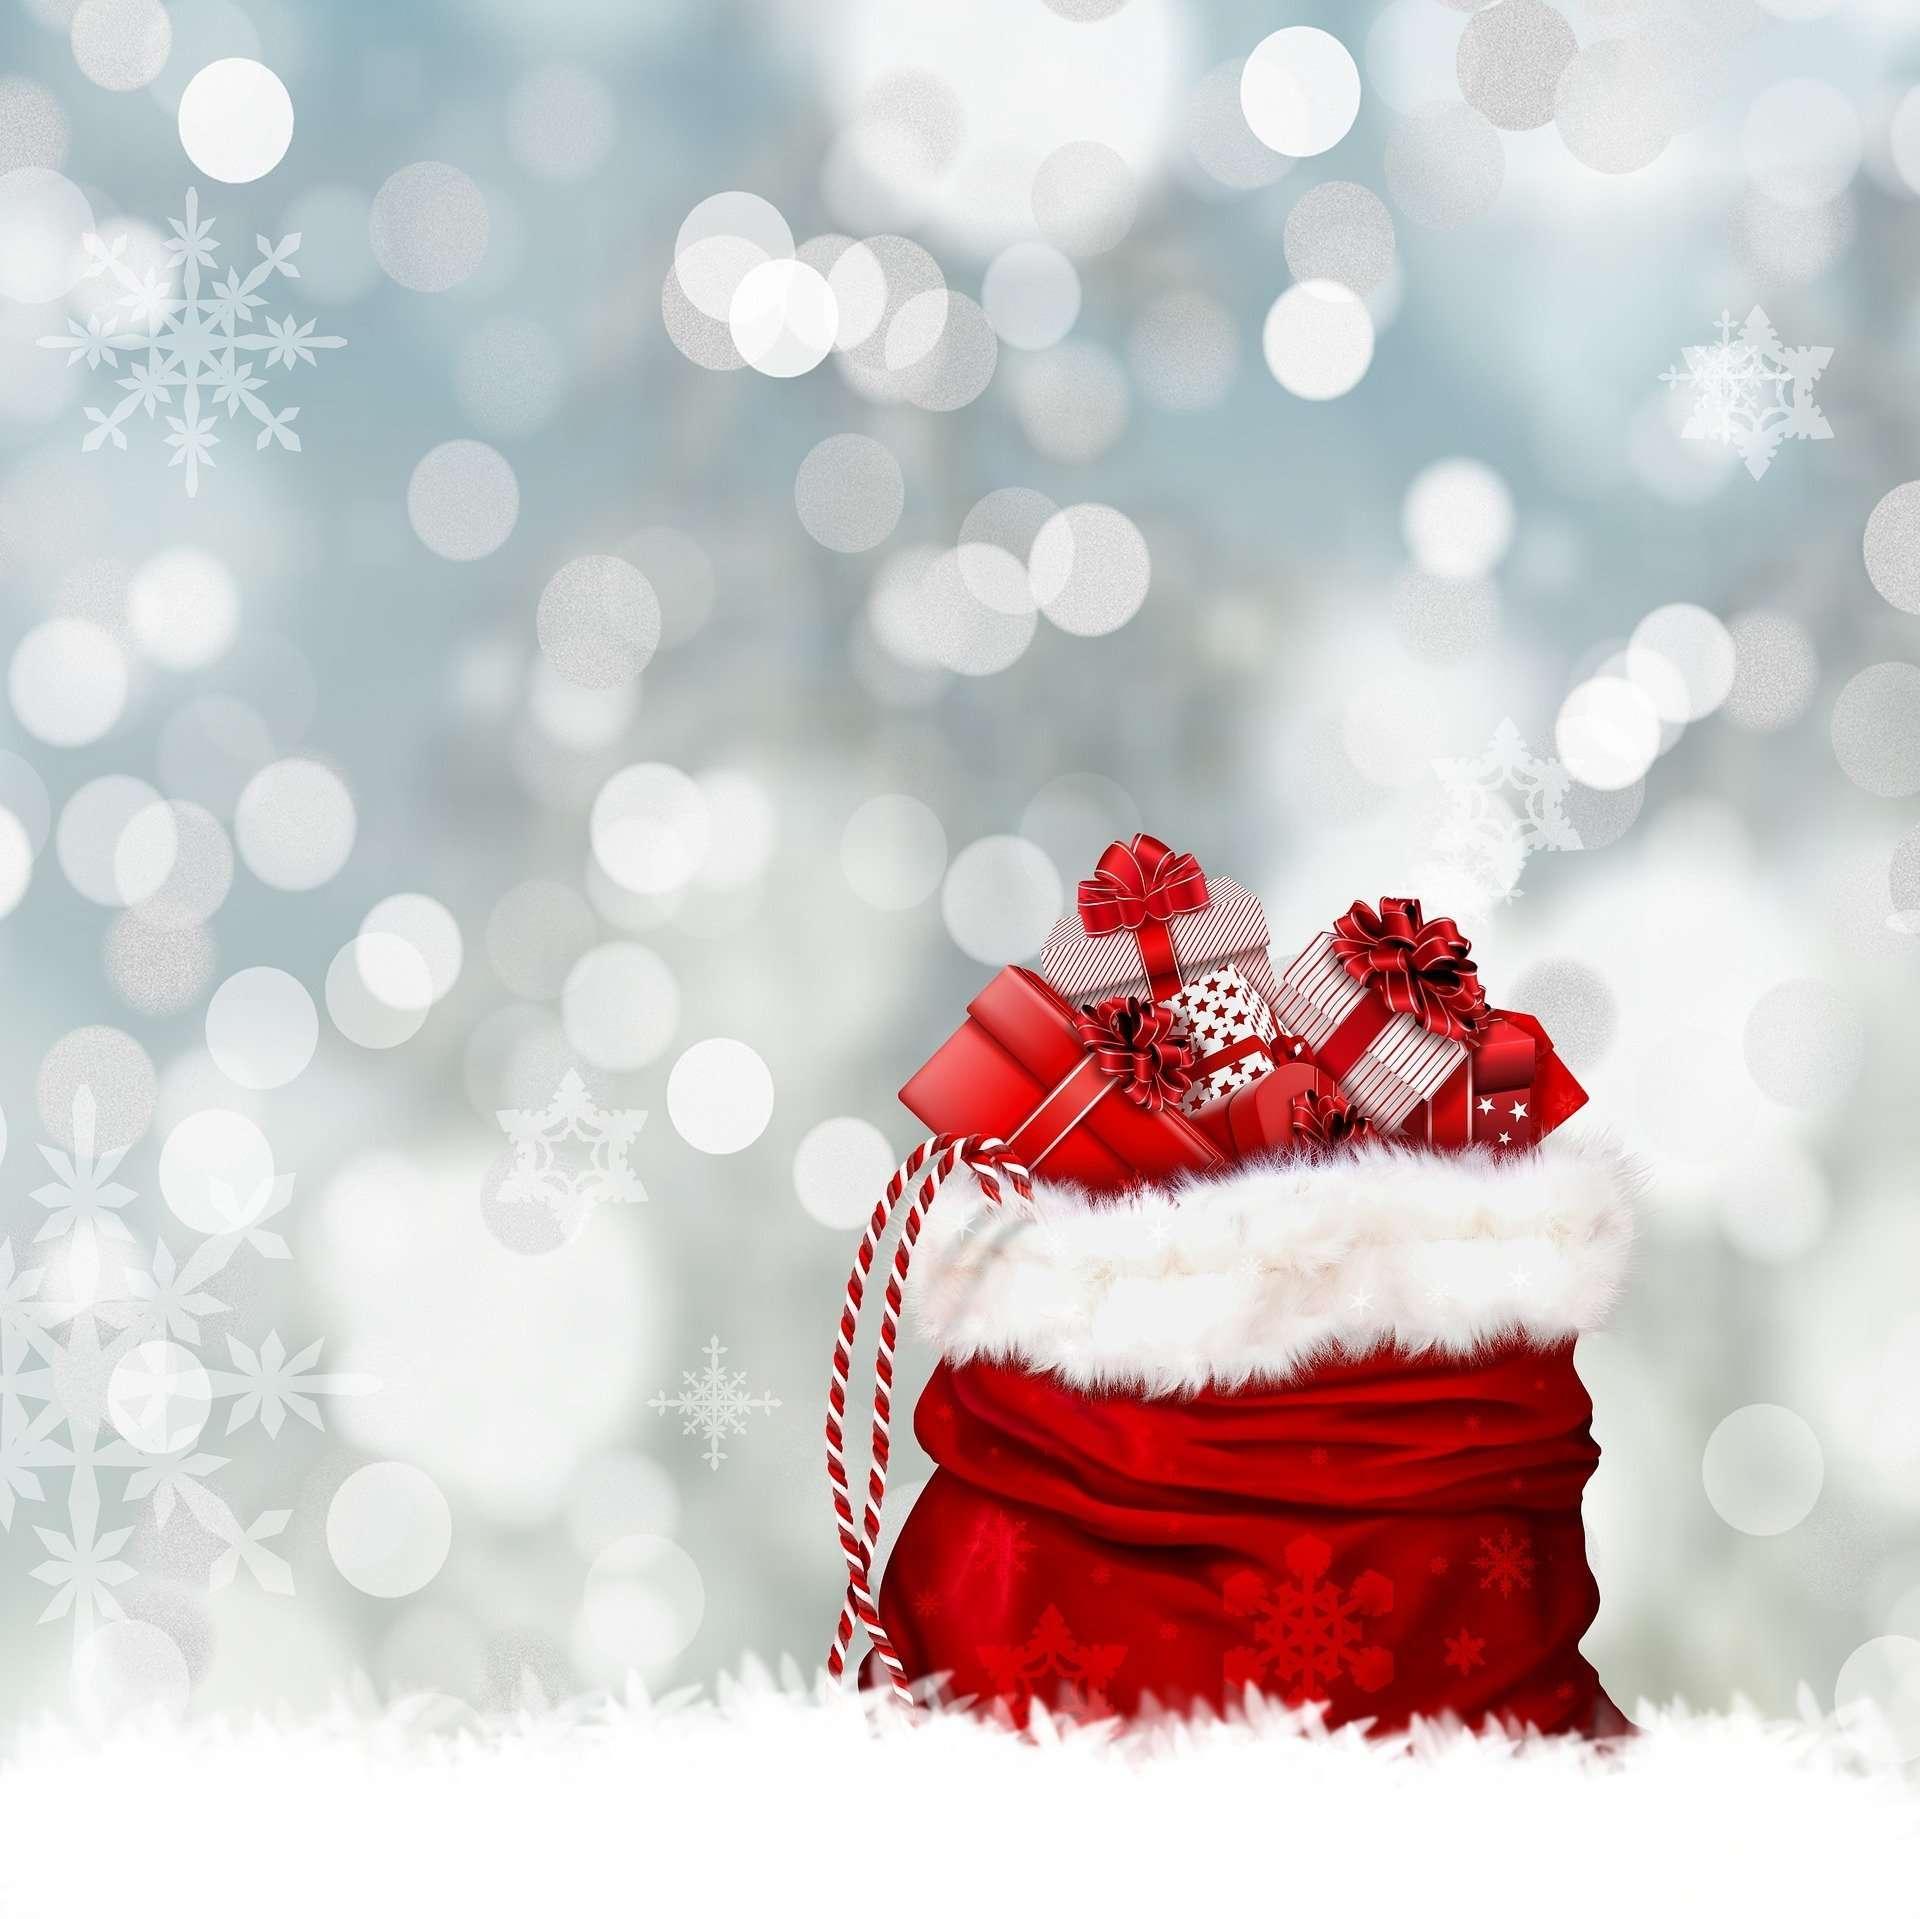 Santa Meet and Greet Locations